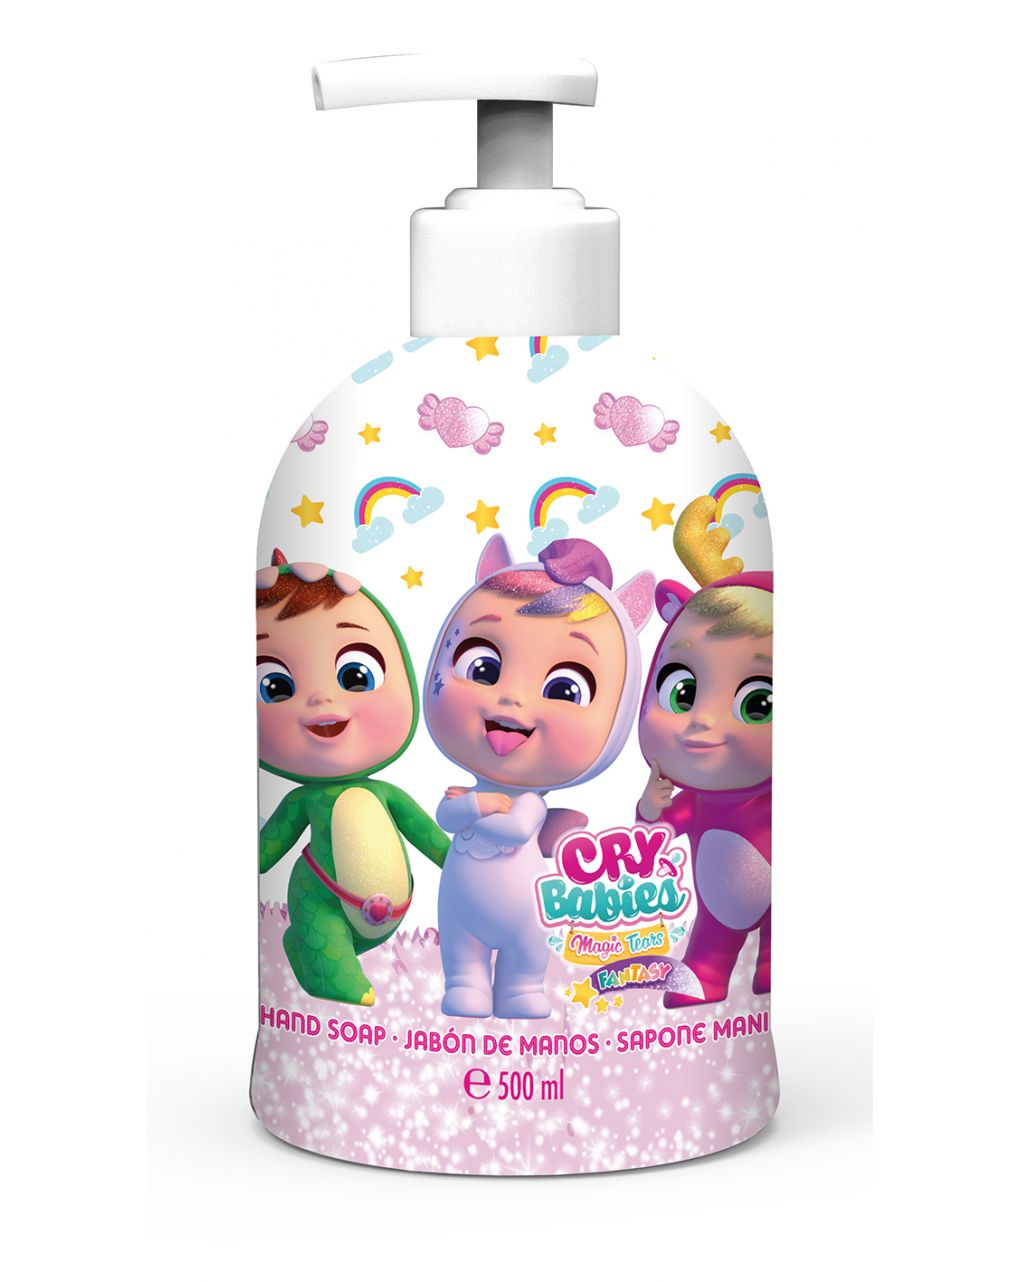 Air-val cry babies sapone mani 500ml - Cry babies